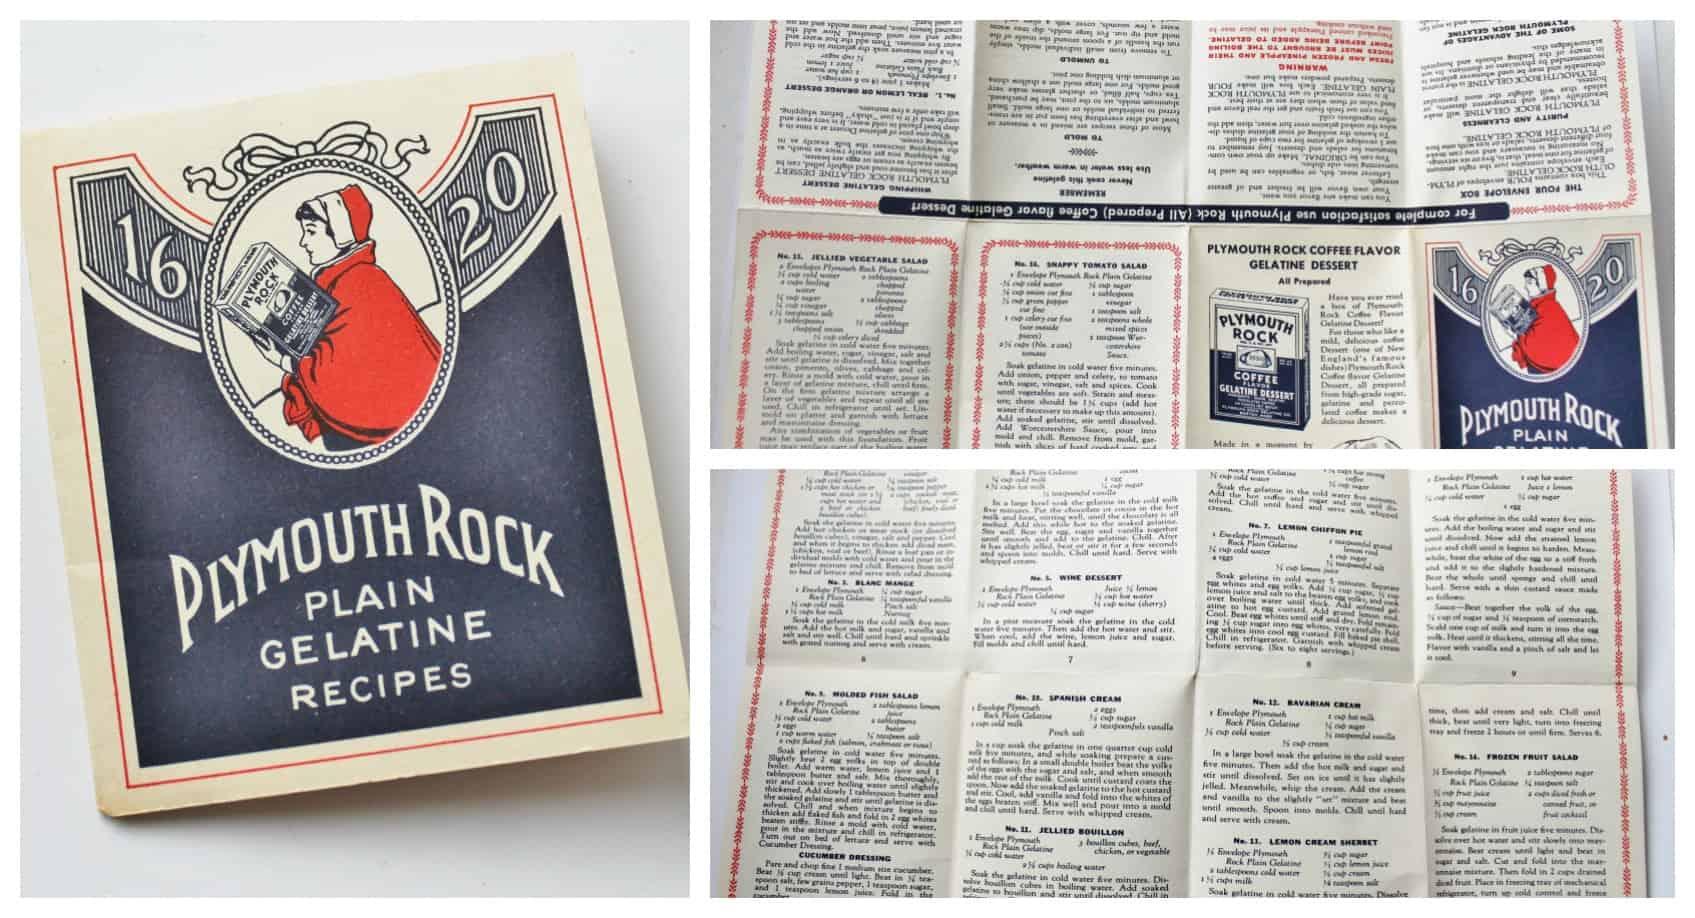 Plymouth Rock Gelatine Recipe booklet